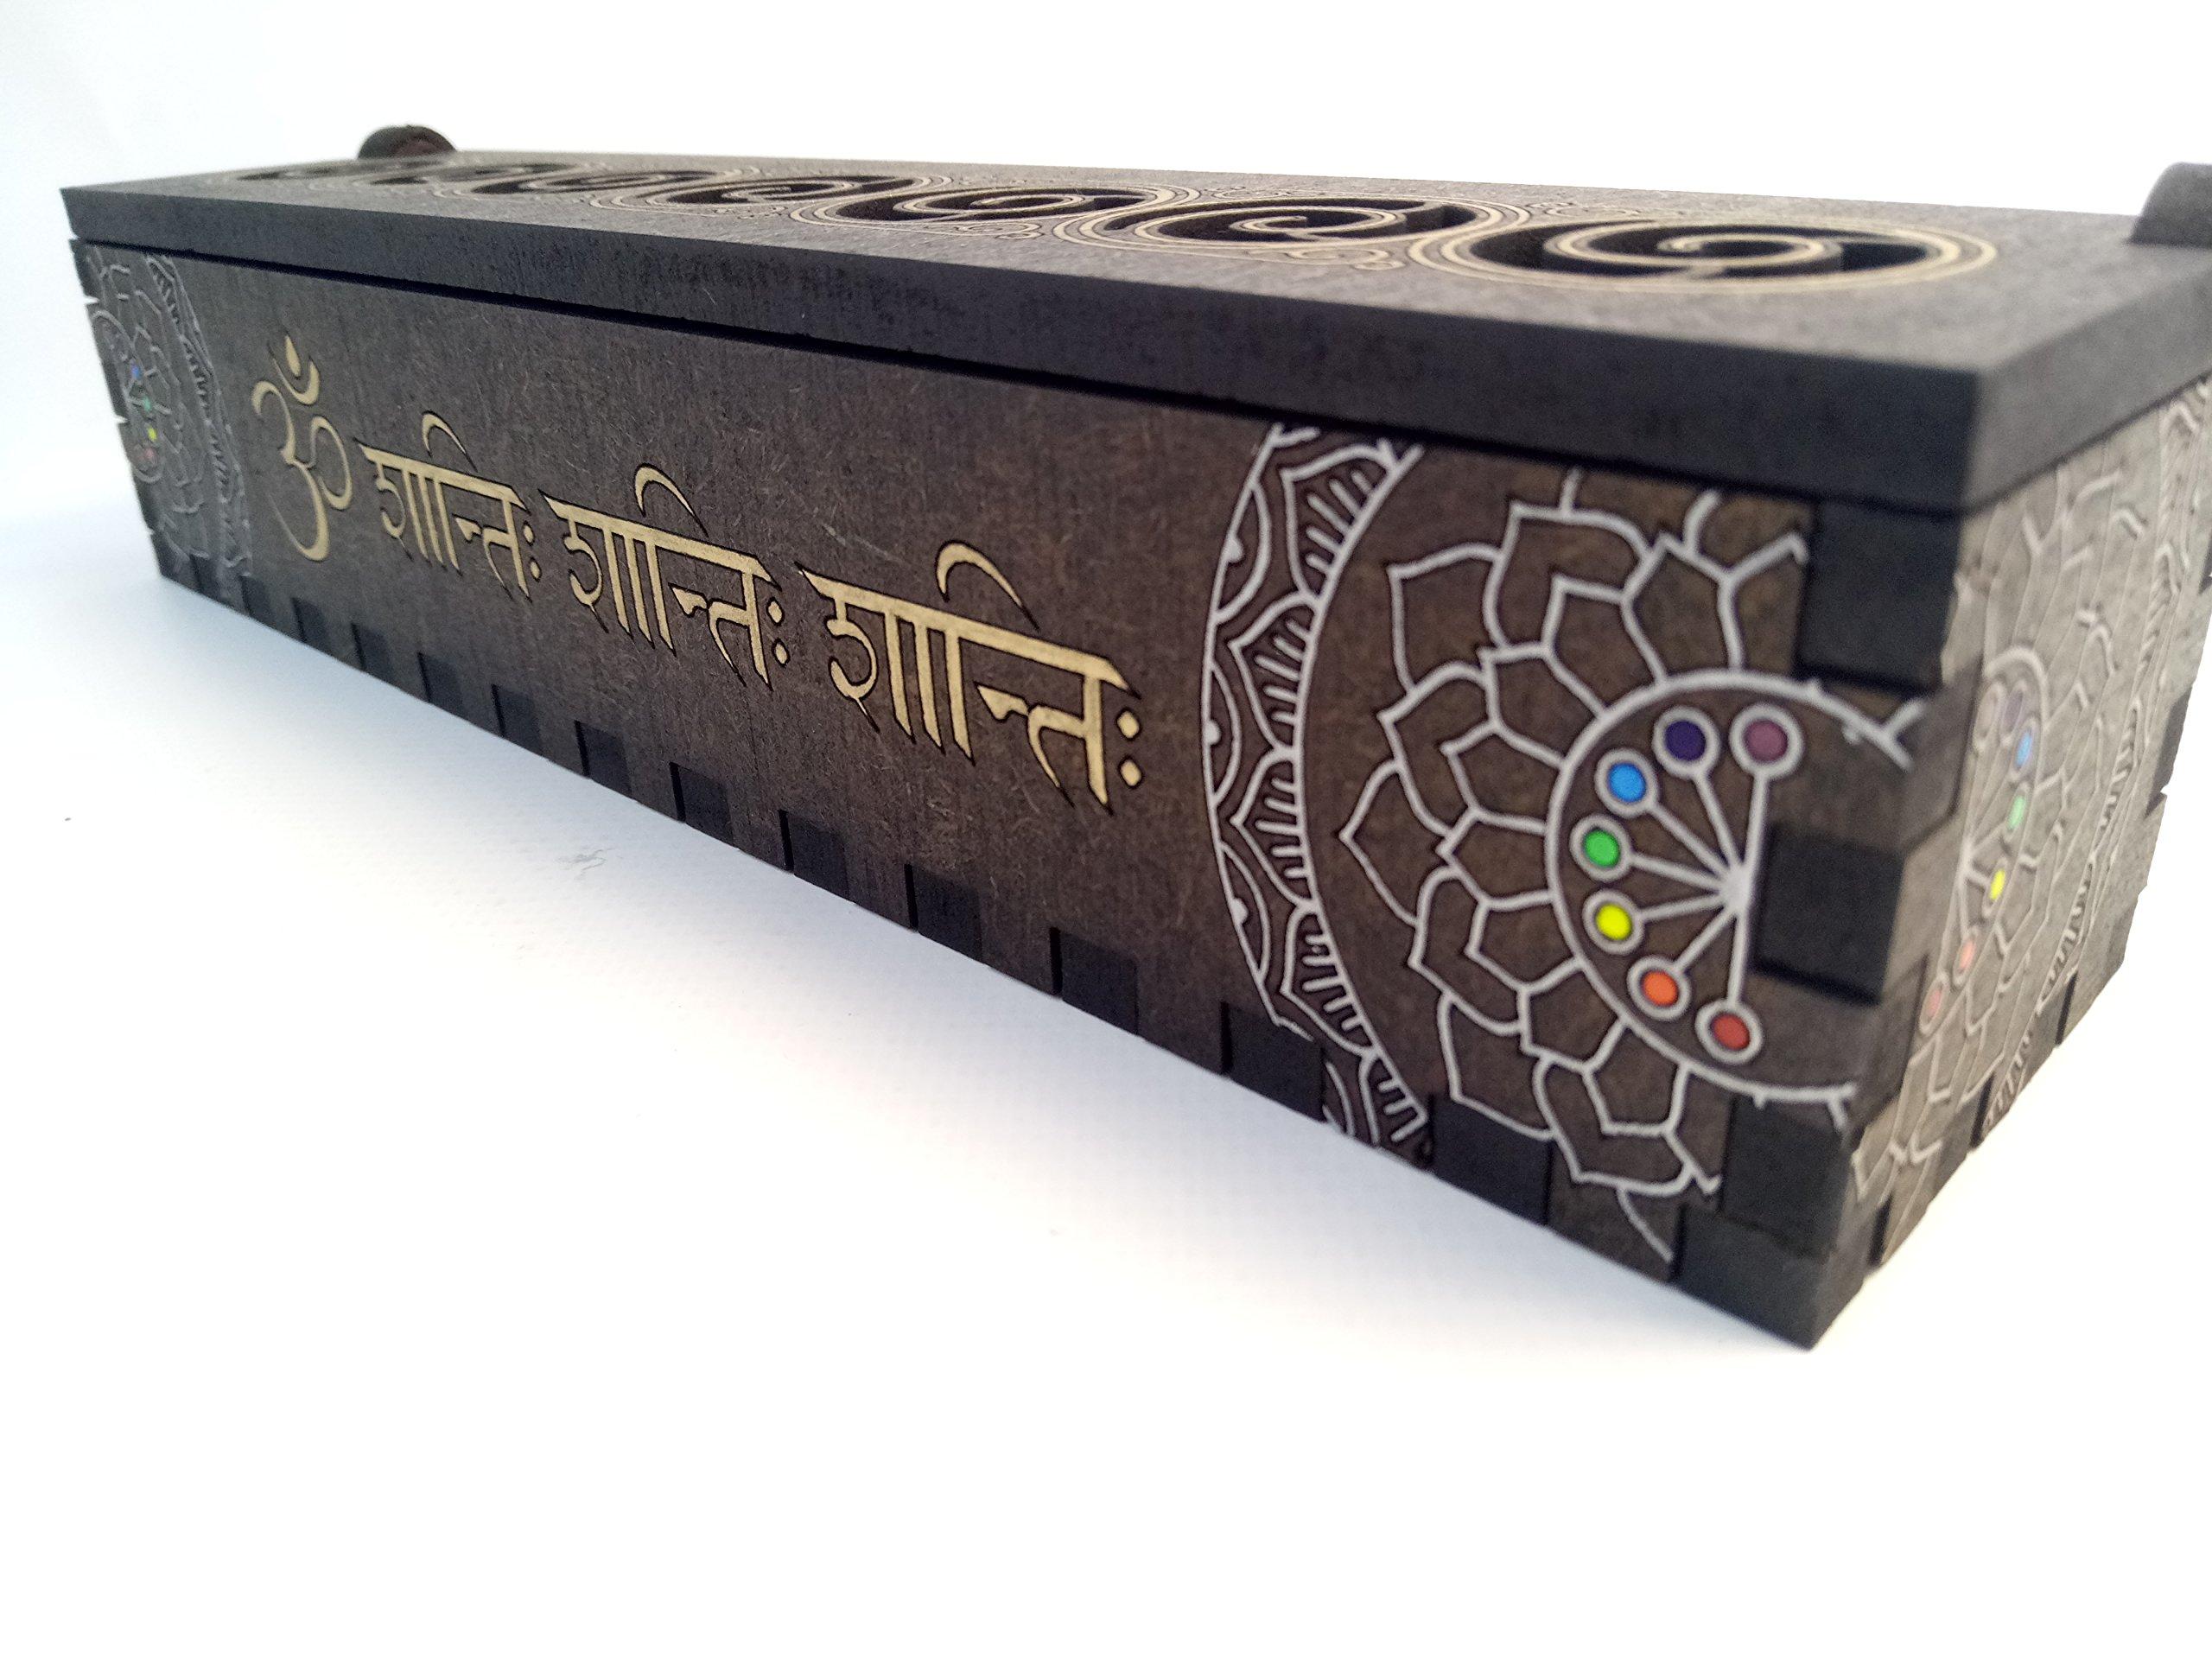 Incense burner box, Hand painted,Om shanti shanti shanti on face, fire safe, MDF 6mm, tibetan style.